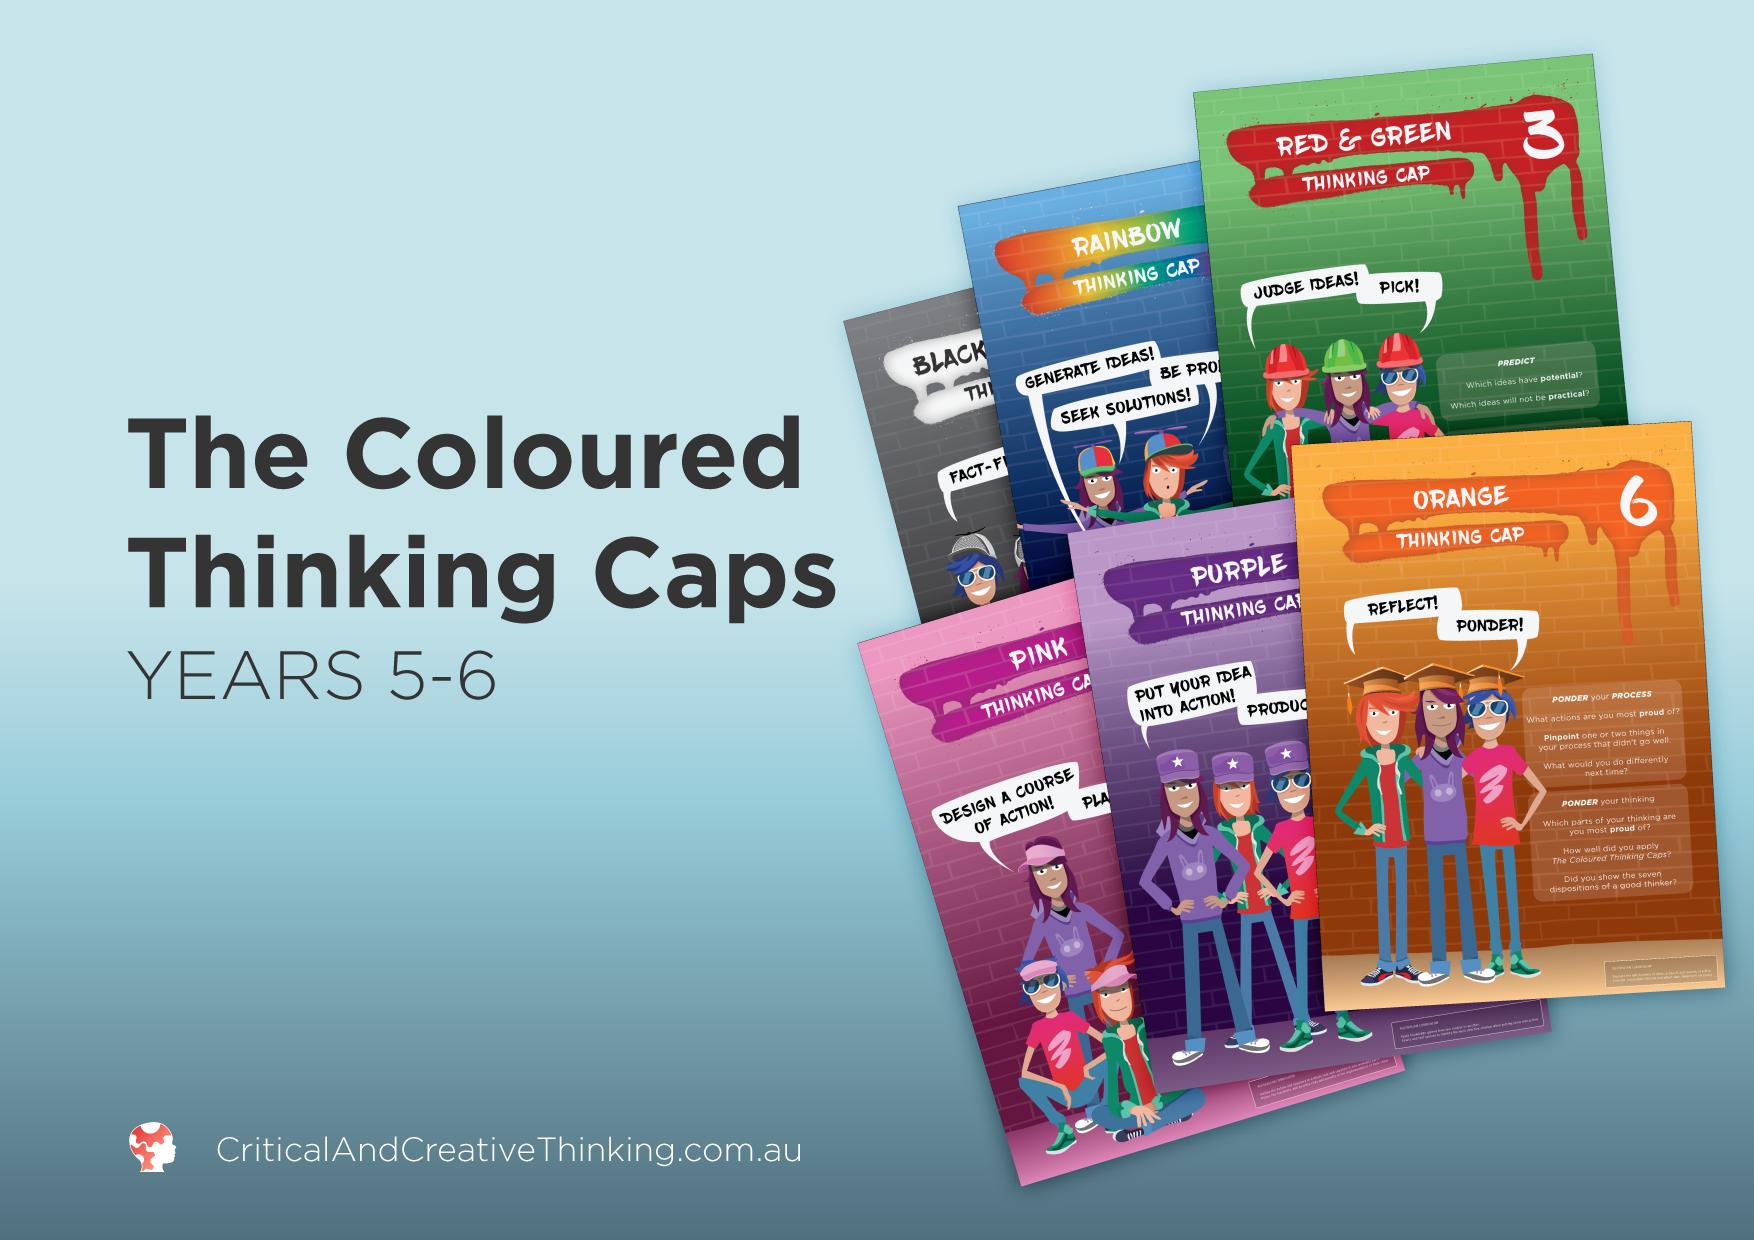 CCT coloured thinking caps year 5 - 6